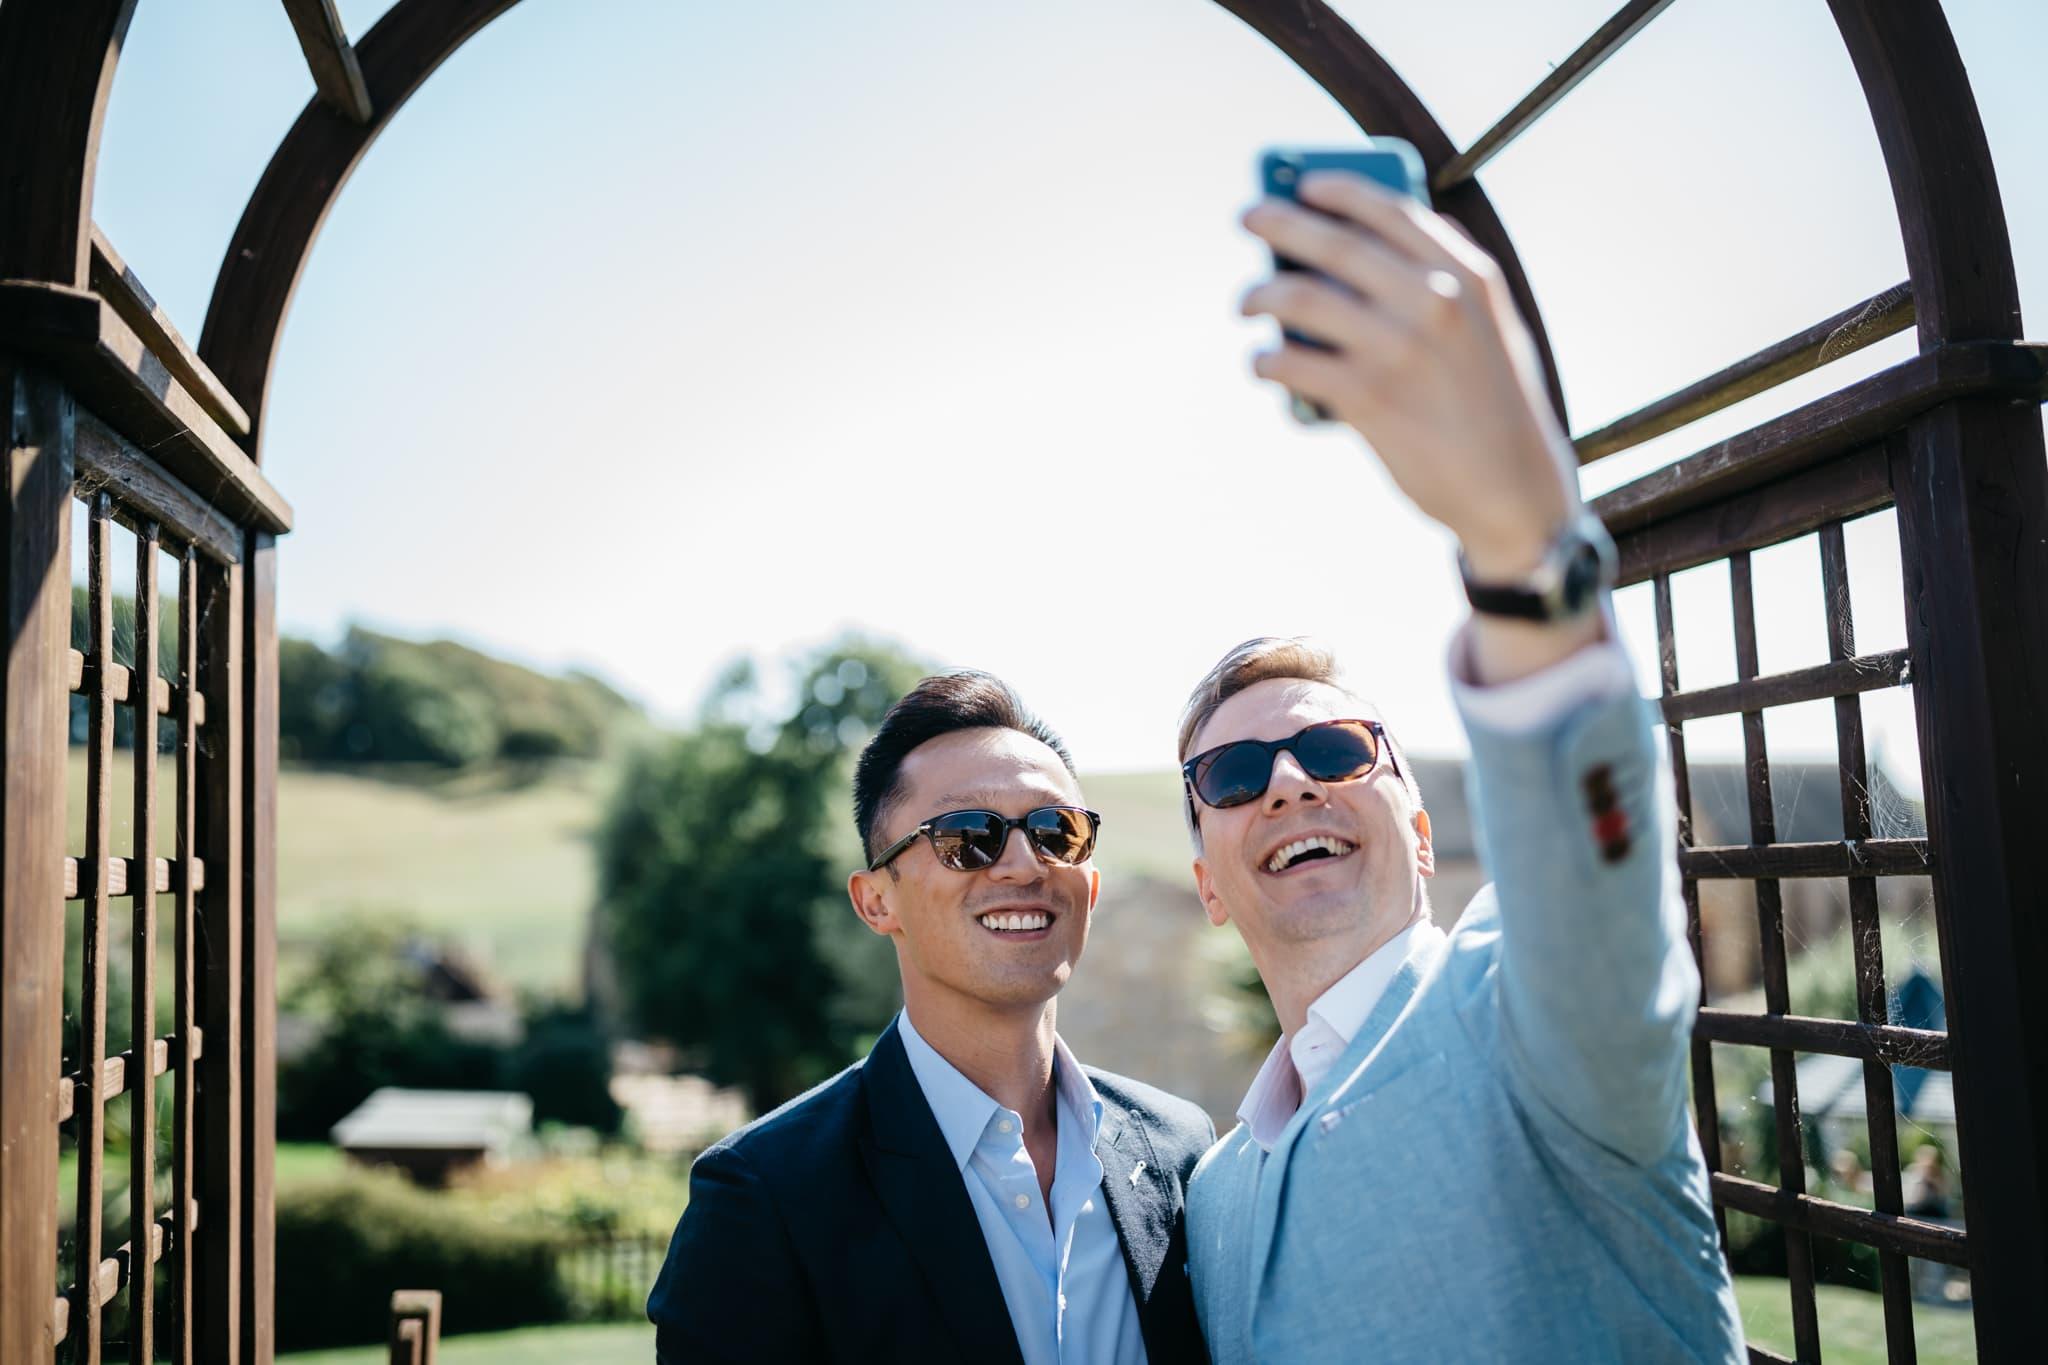 Guests at wedding taking selfie